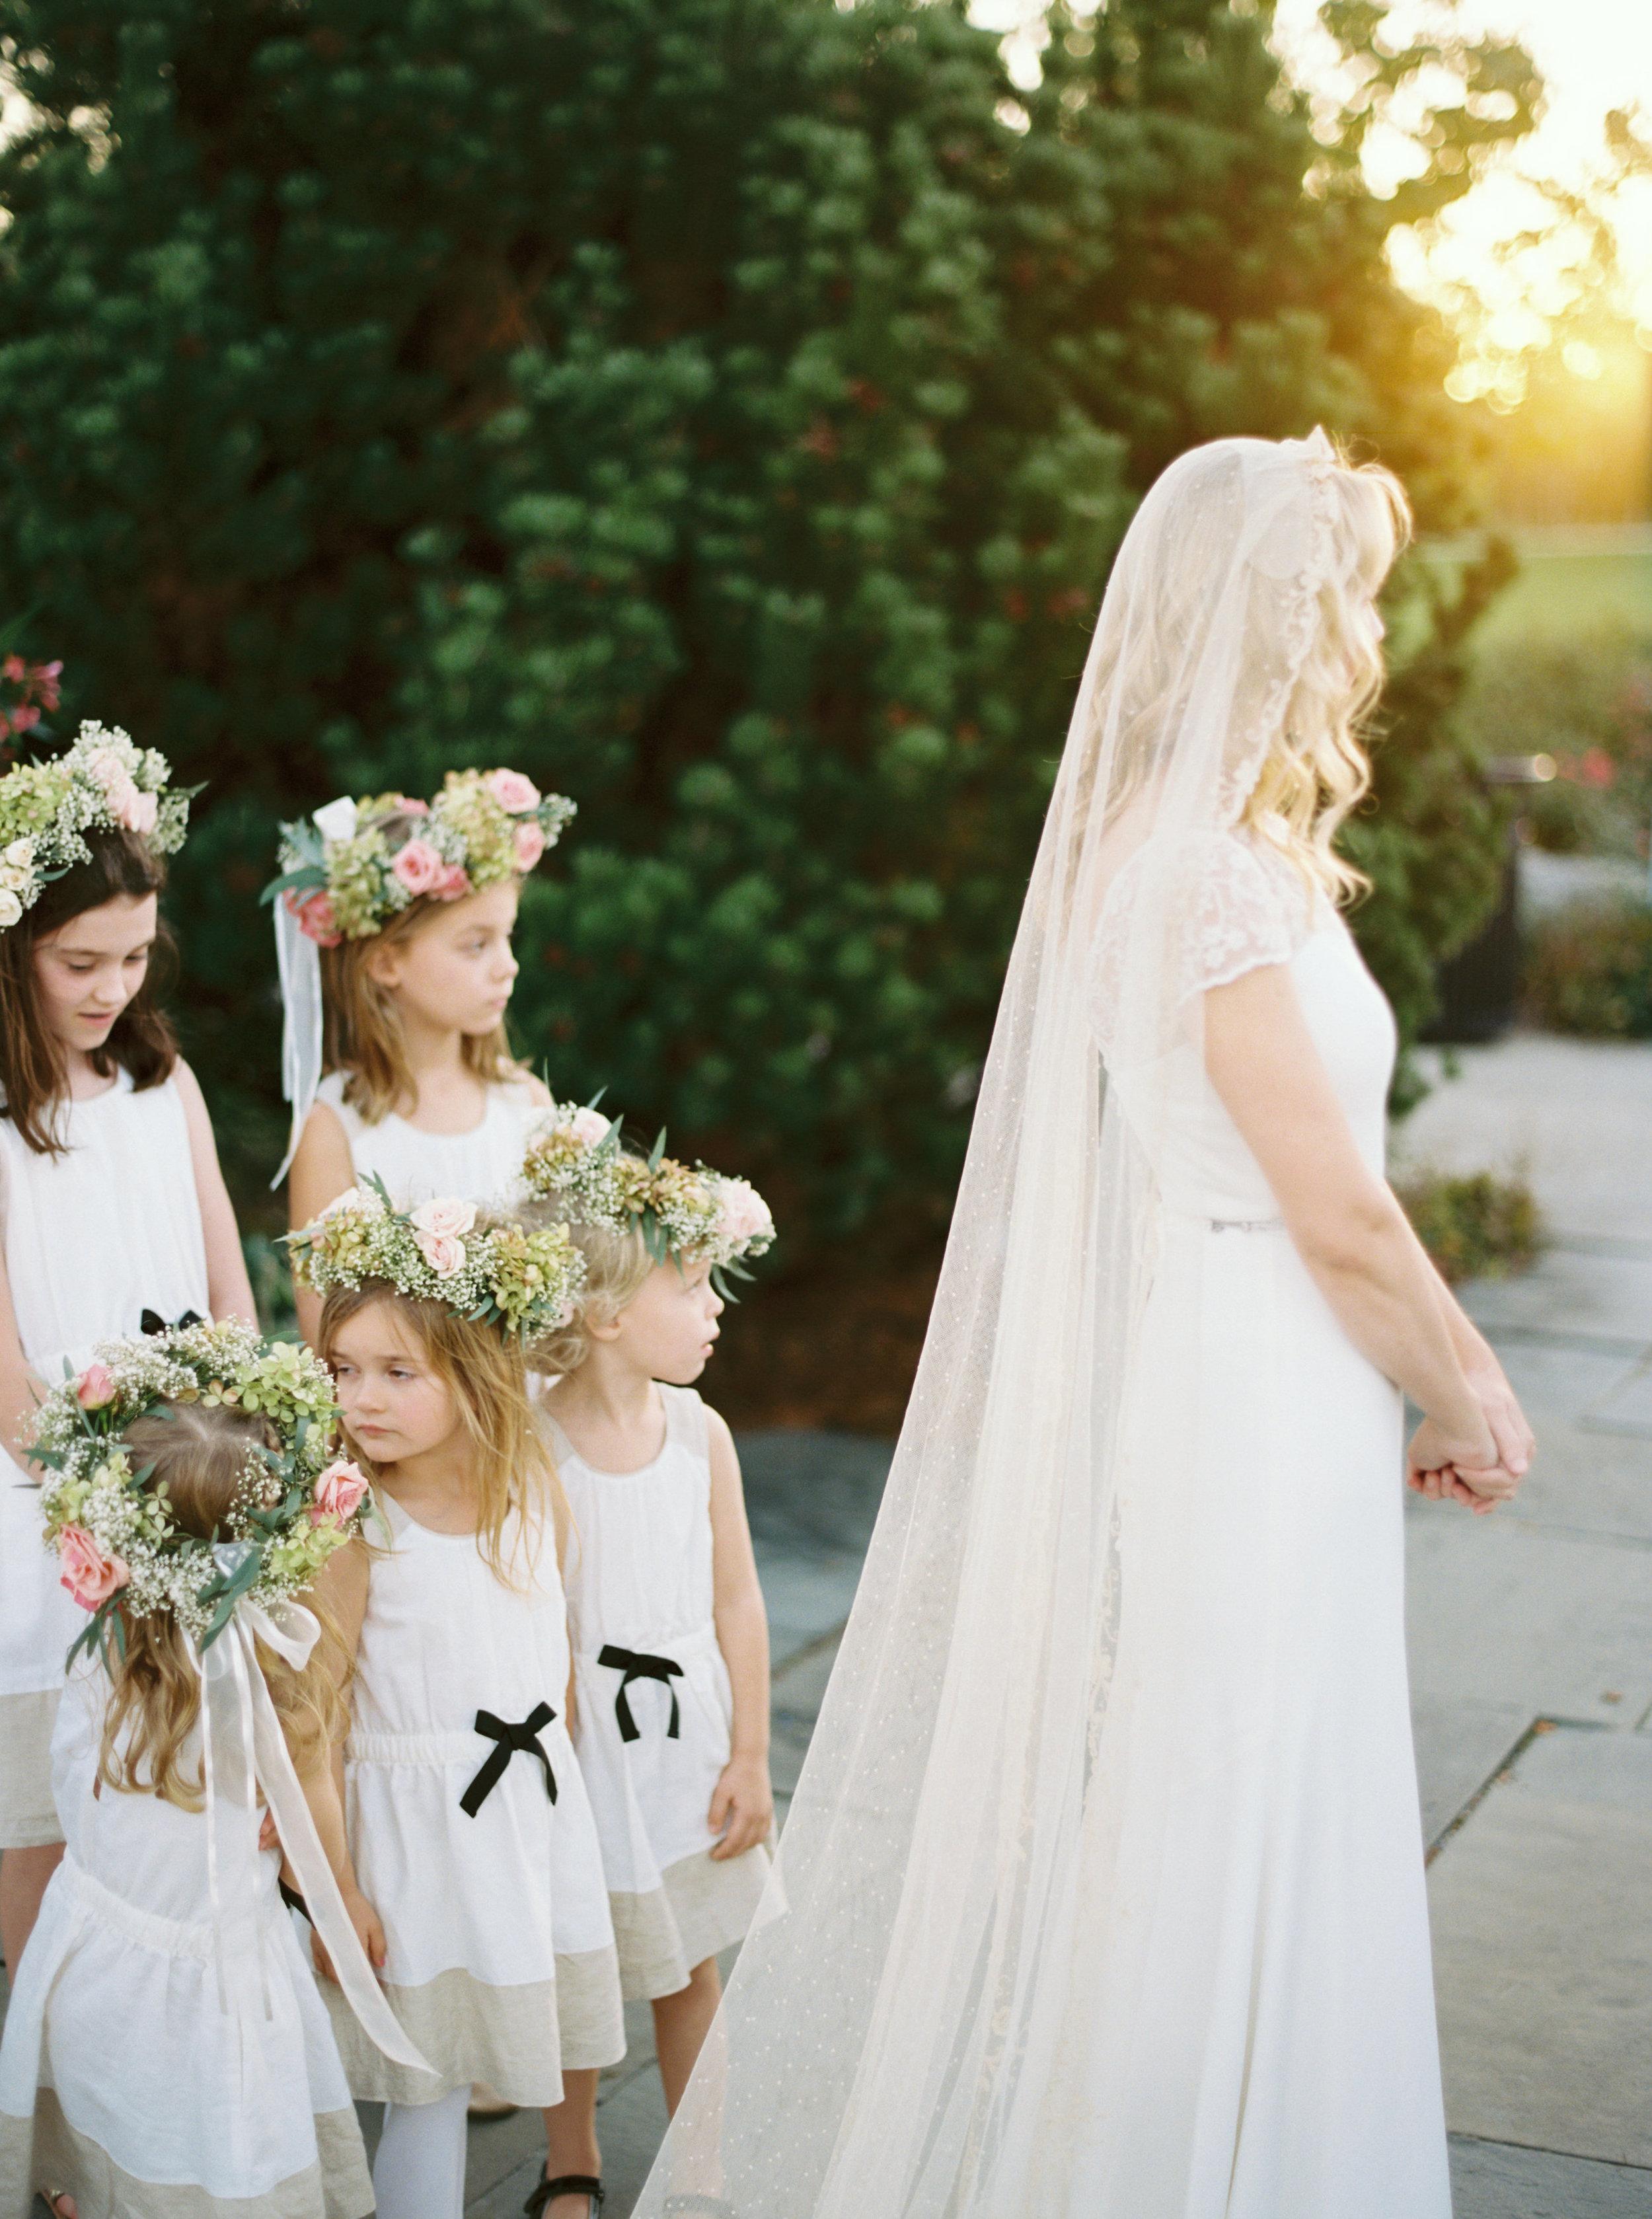 Kyle John l Fine Art Wedding Photography l Chicago, Copenhagen, California, New York, Destination l Blog l Alice & Aaron_14